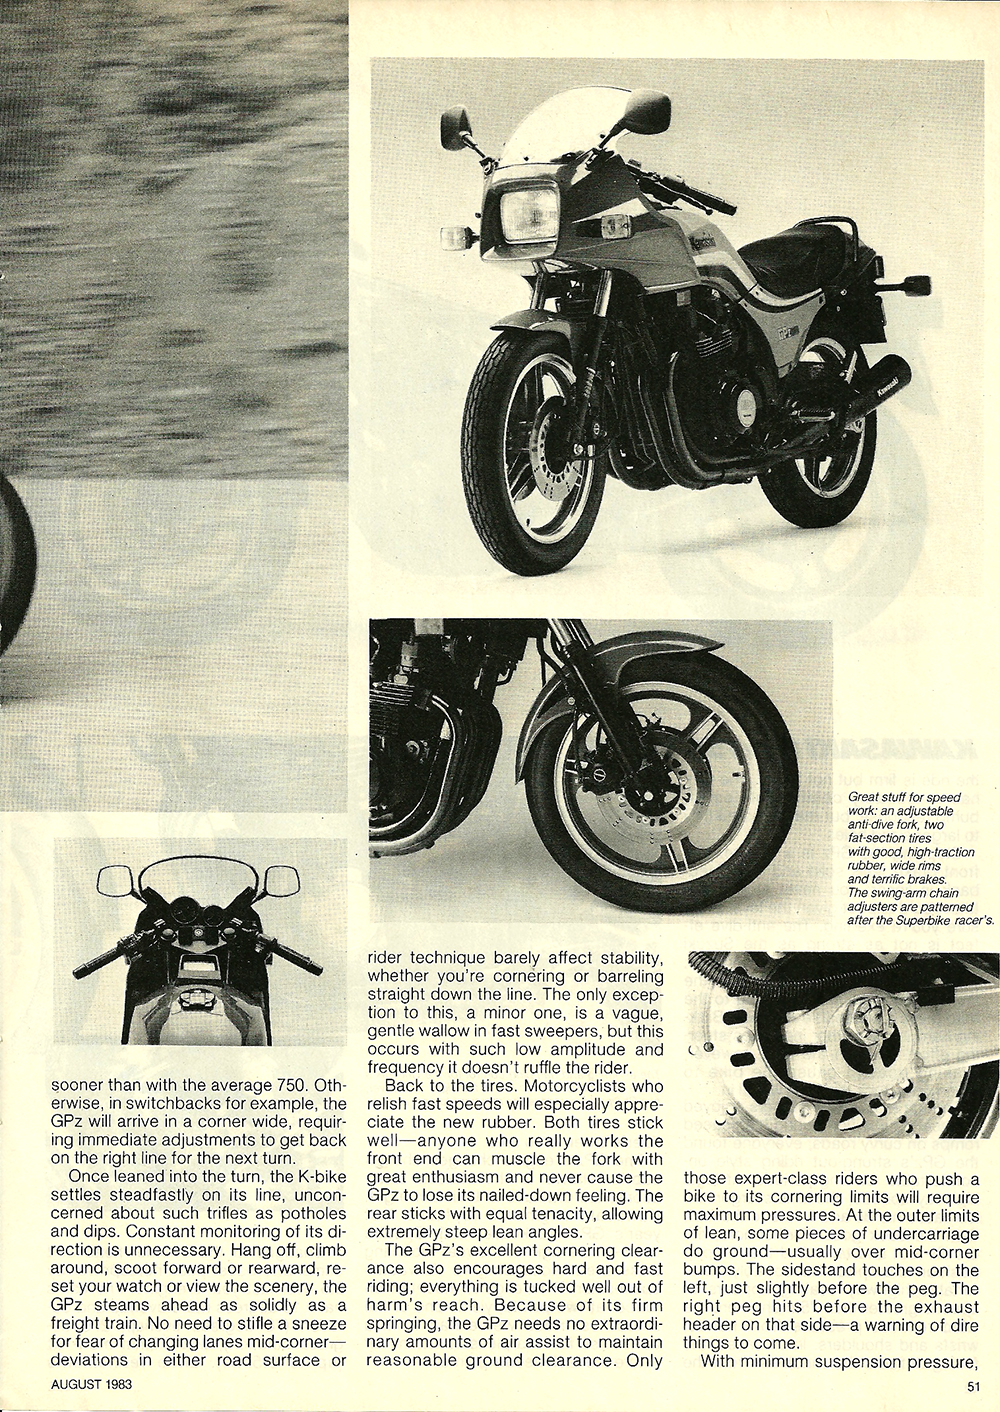 1983 Kawasaki GPz 750 road test 4.jpg